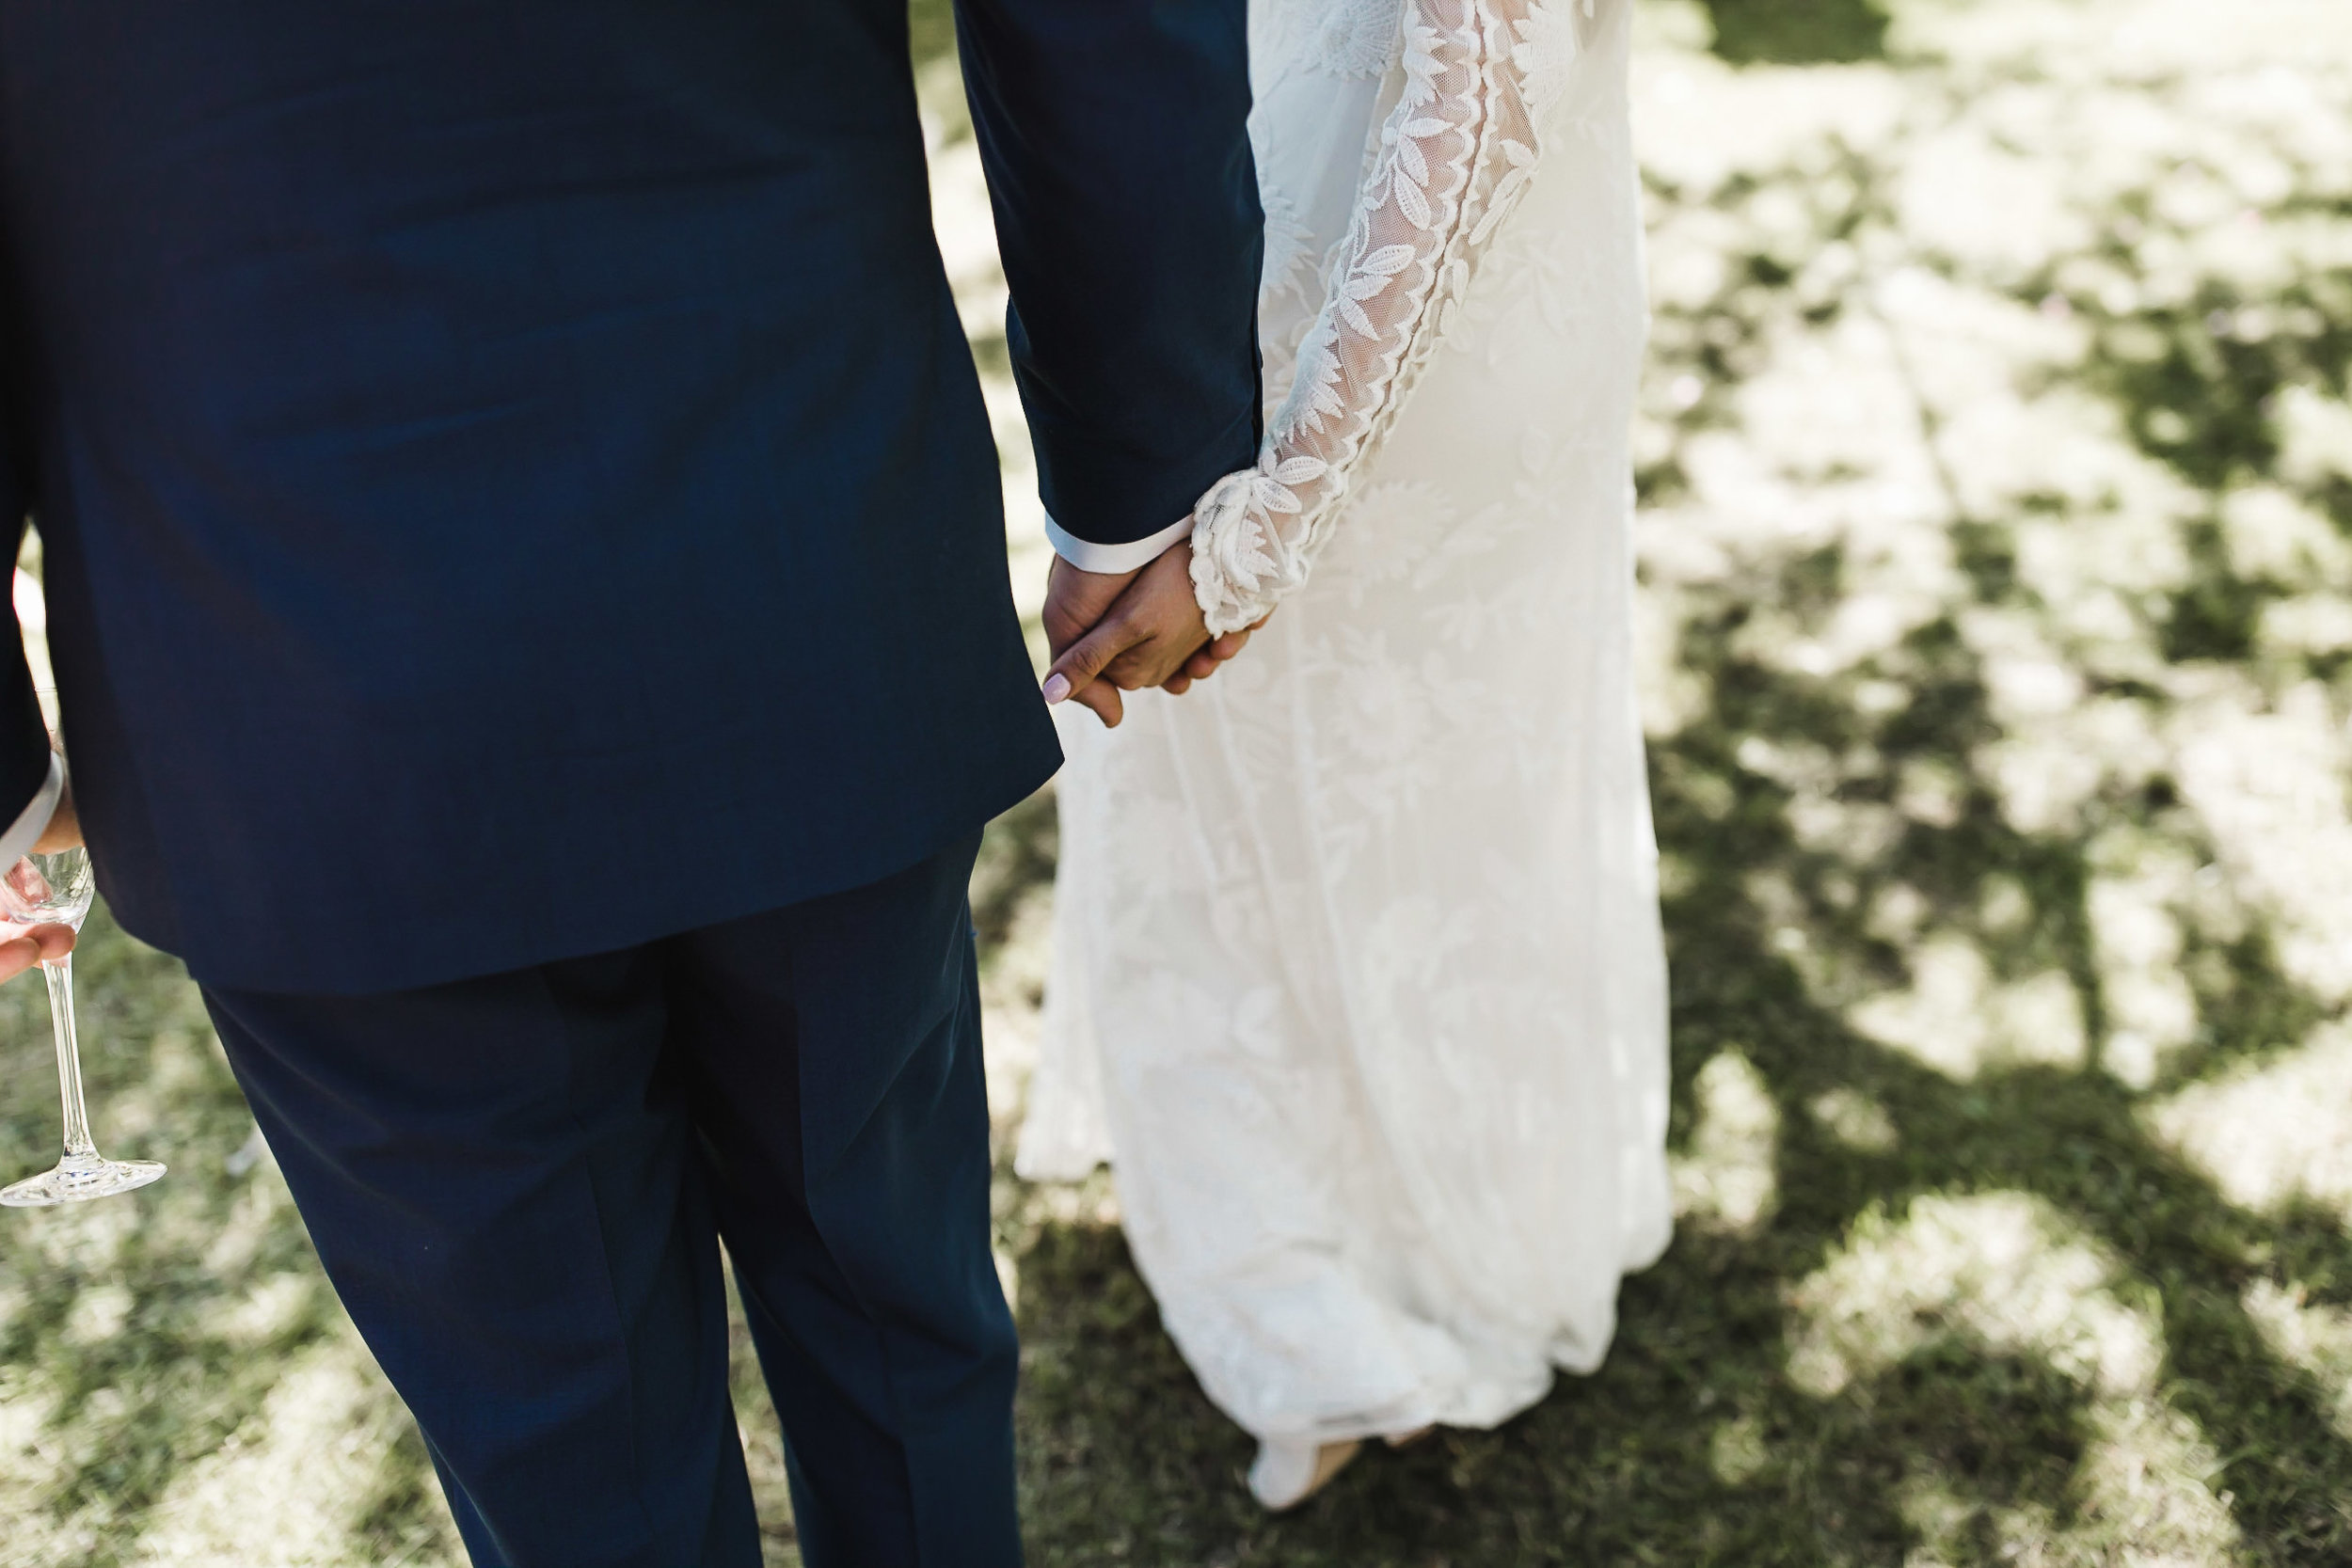 Roundhay-Leeds-Backyard-Wedding-Becs-Chris-112.jpg